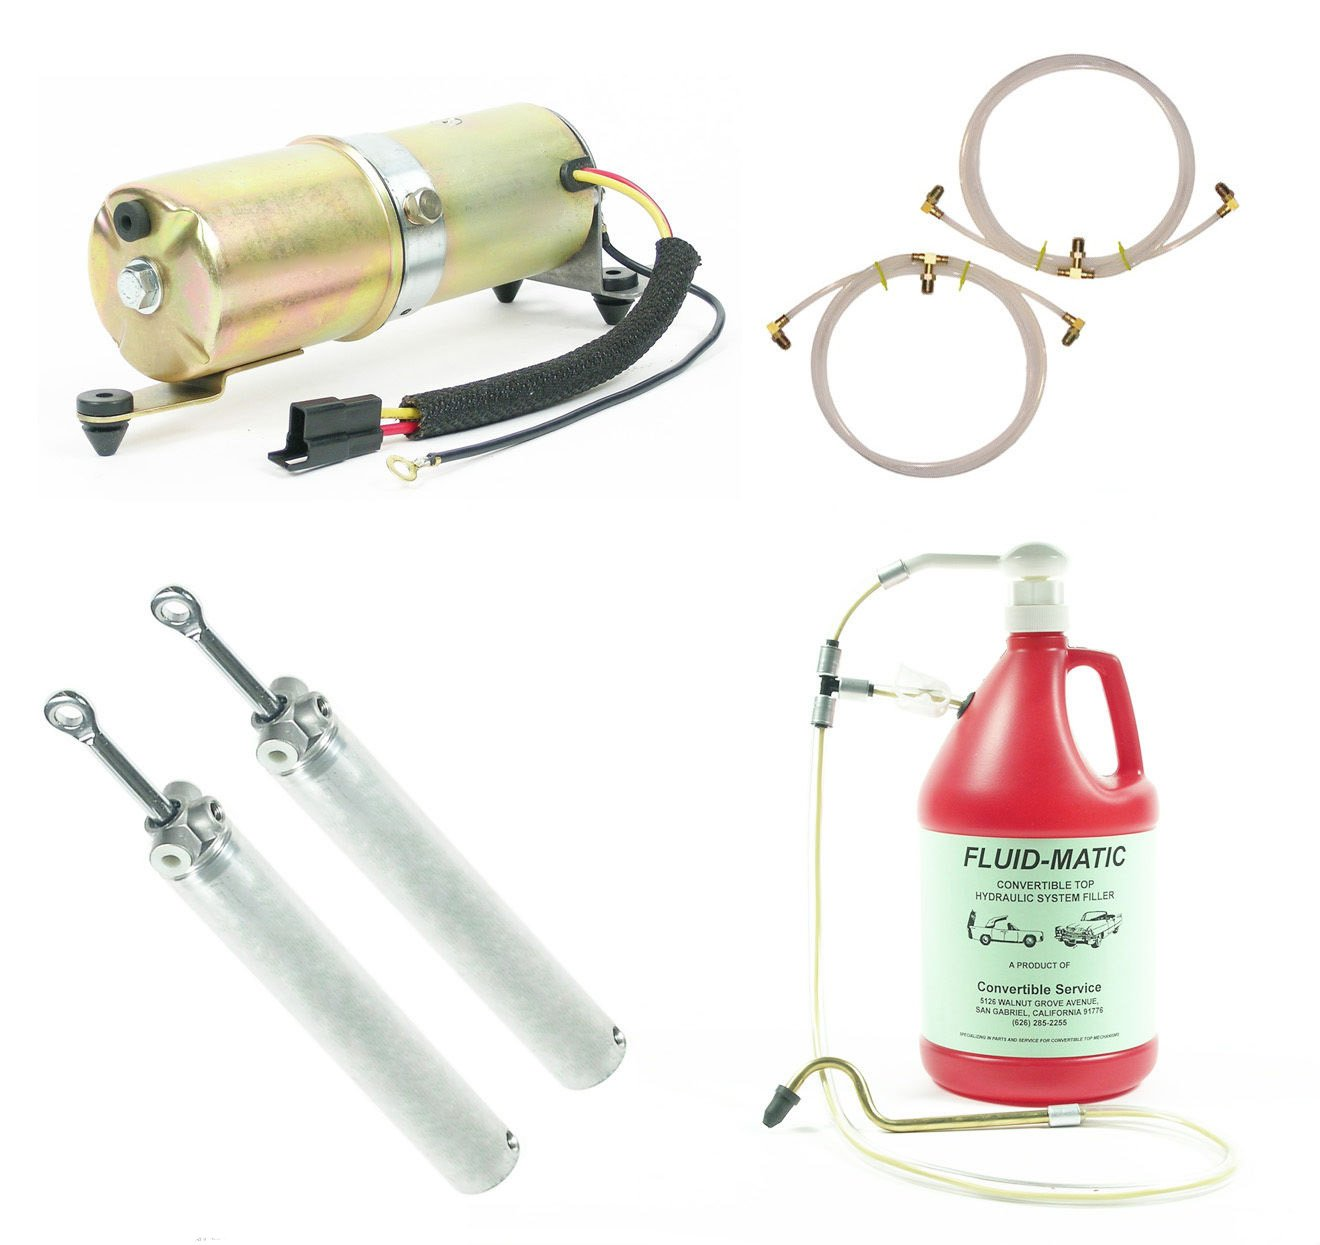 1967 1968 1969 Camaro / Firebird Convertible Top Hydraulic System Cylinders Hoses Motor + Bleed Tool